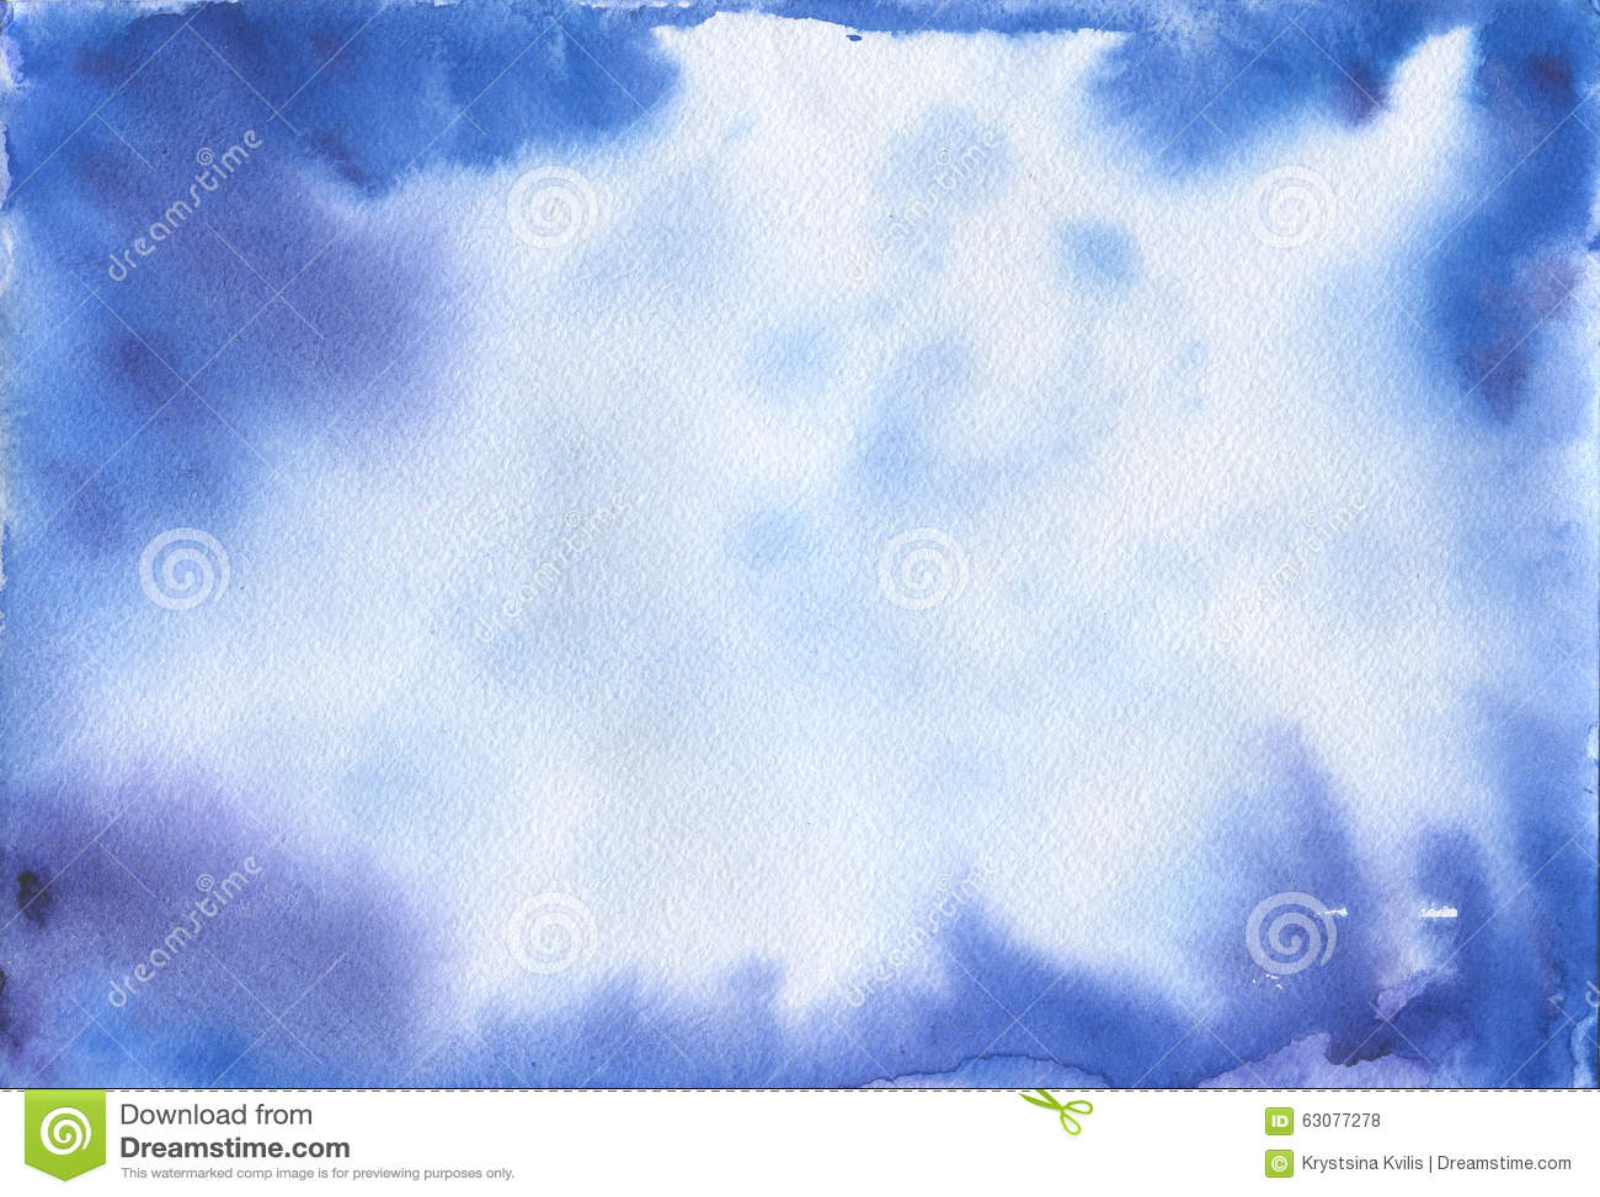 Download Fond Bleu Abstrait D'aquarelle L'espace Illustration Stock - Illustration du abstrait, balayé: 63077278